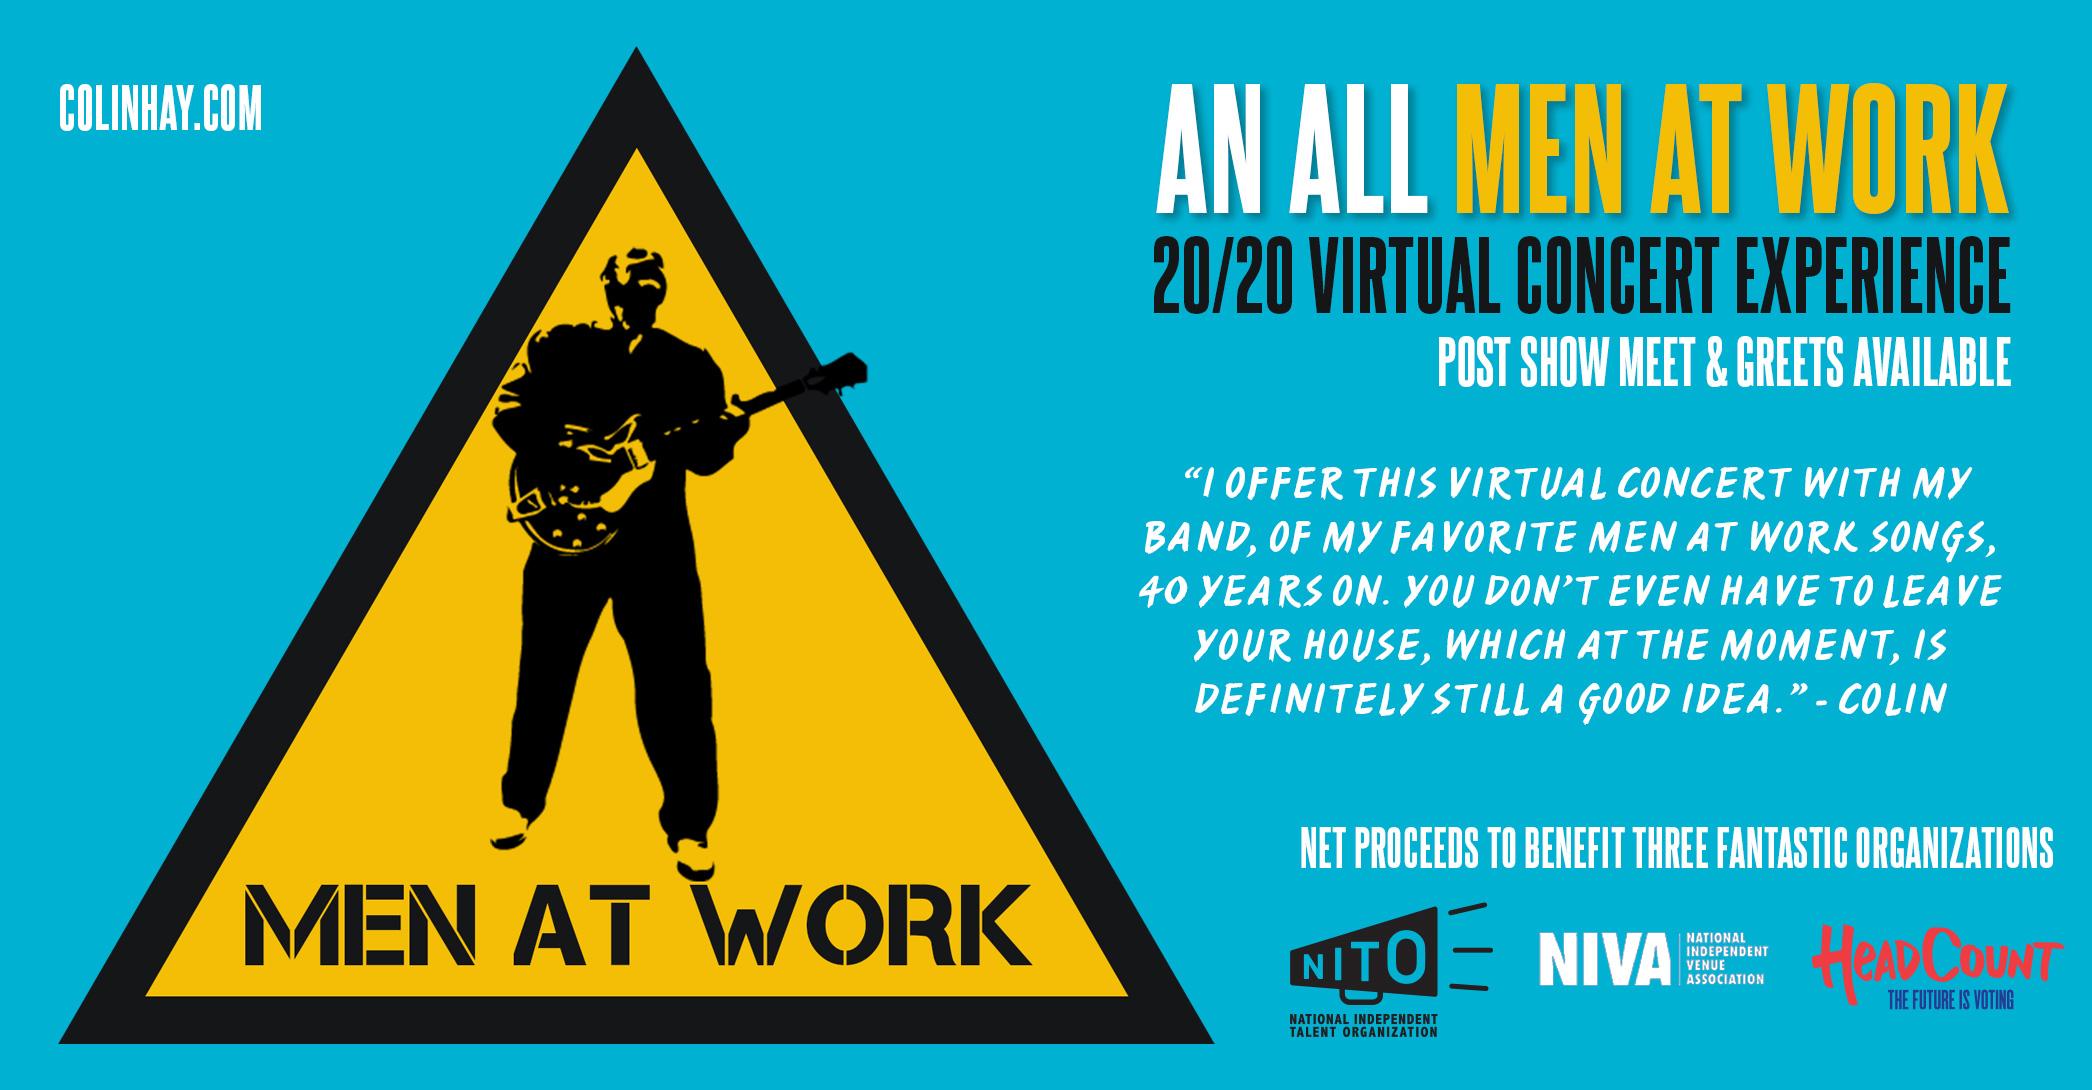 Men at Work 20/20 Virtual Concert Experience (Nov 1, 2020)